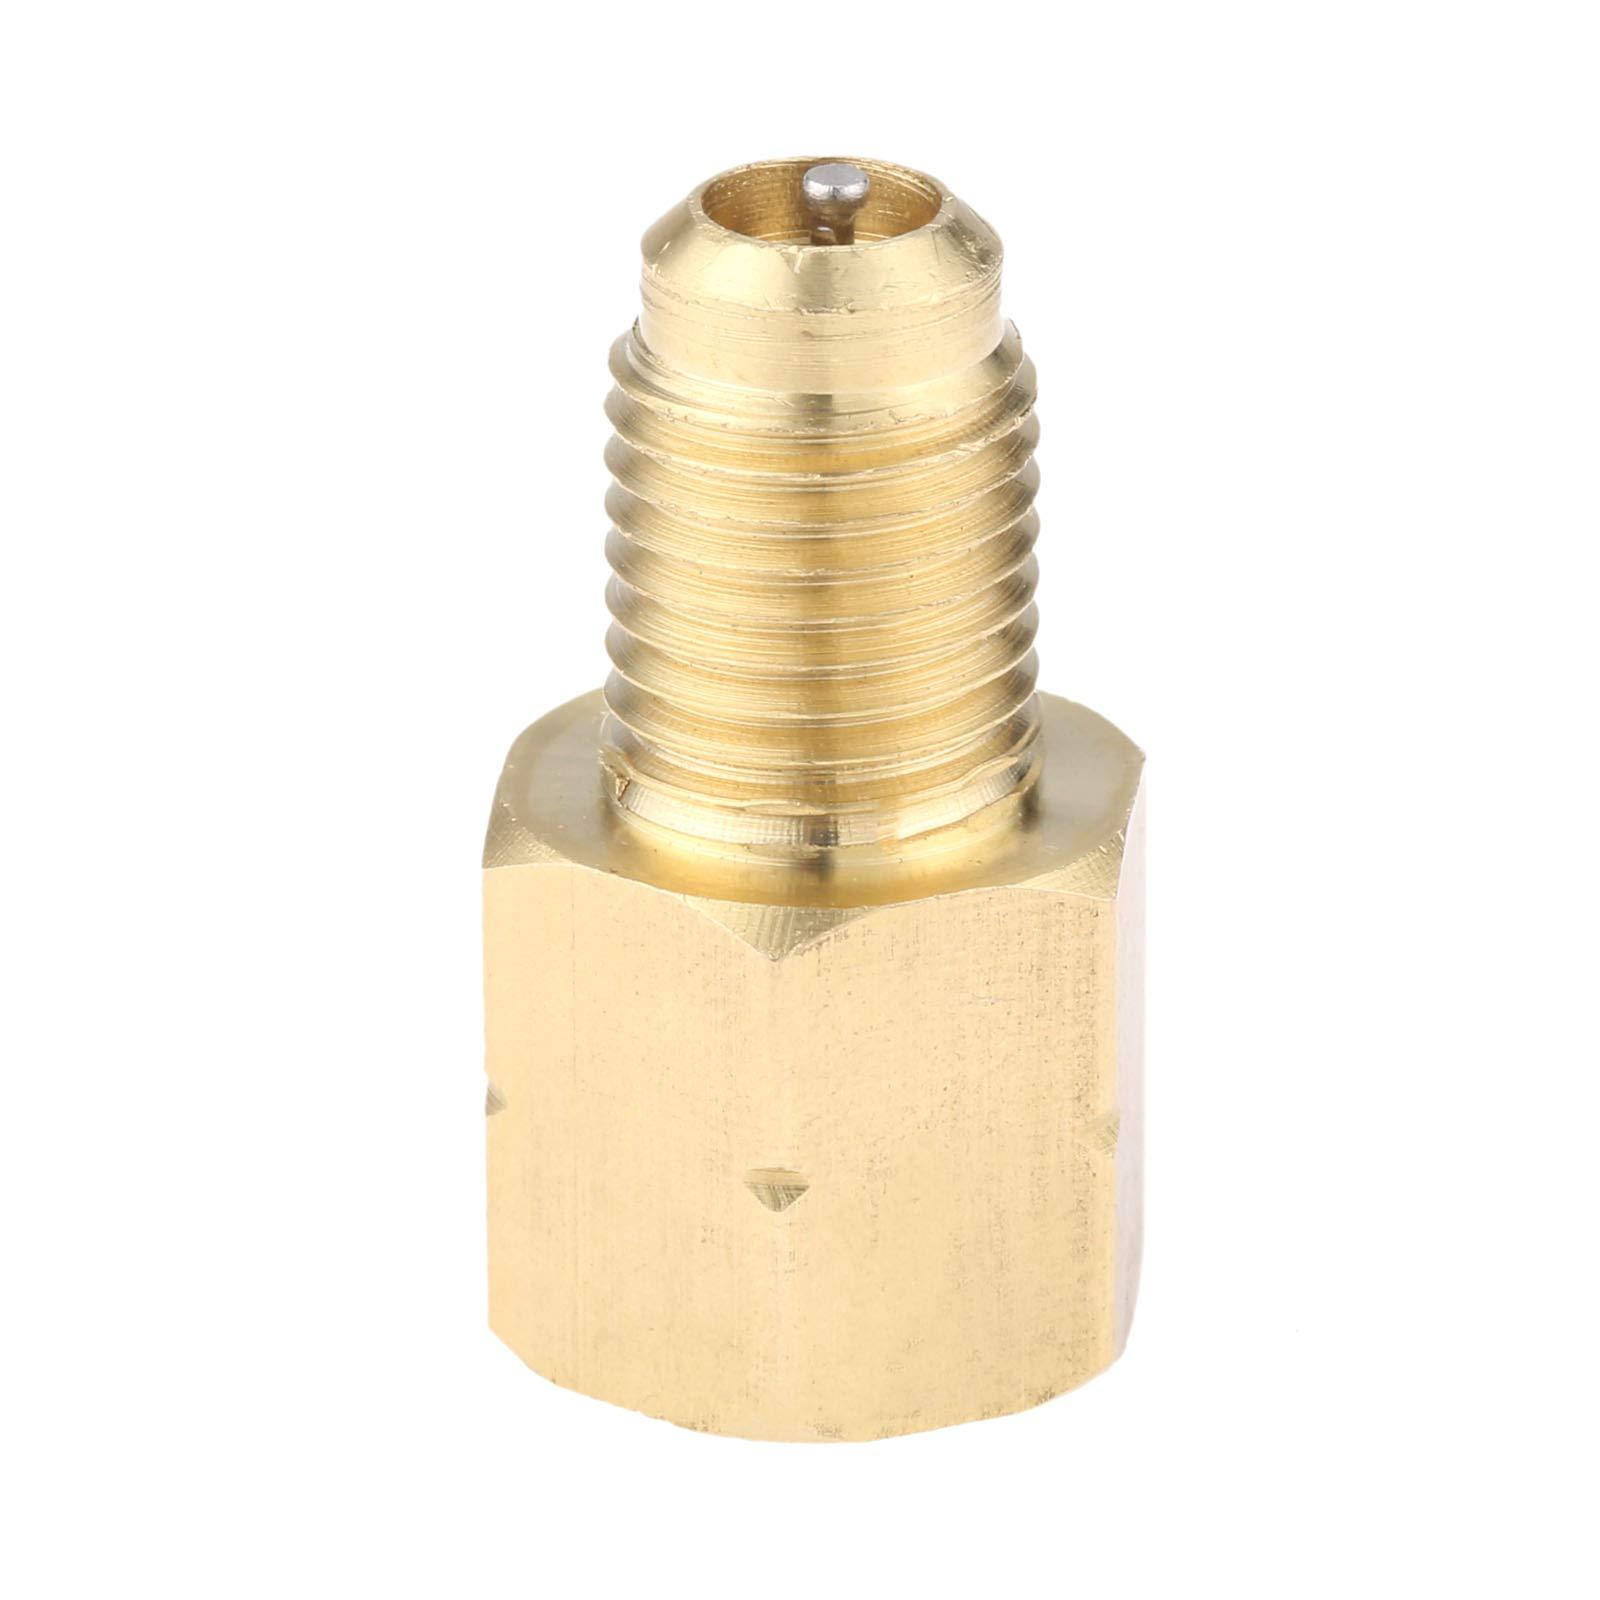 Wisepick R1234YF Can Tap 1//2/″ ACME w//LH threads female X 1//4/″ SAE female X 1//2/″ ACME male Vacuum Pump Adapter